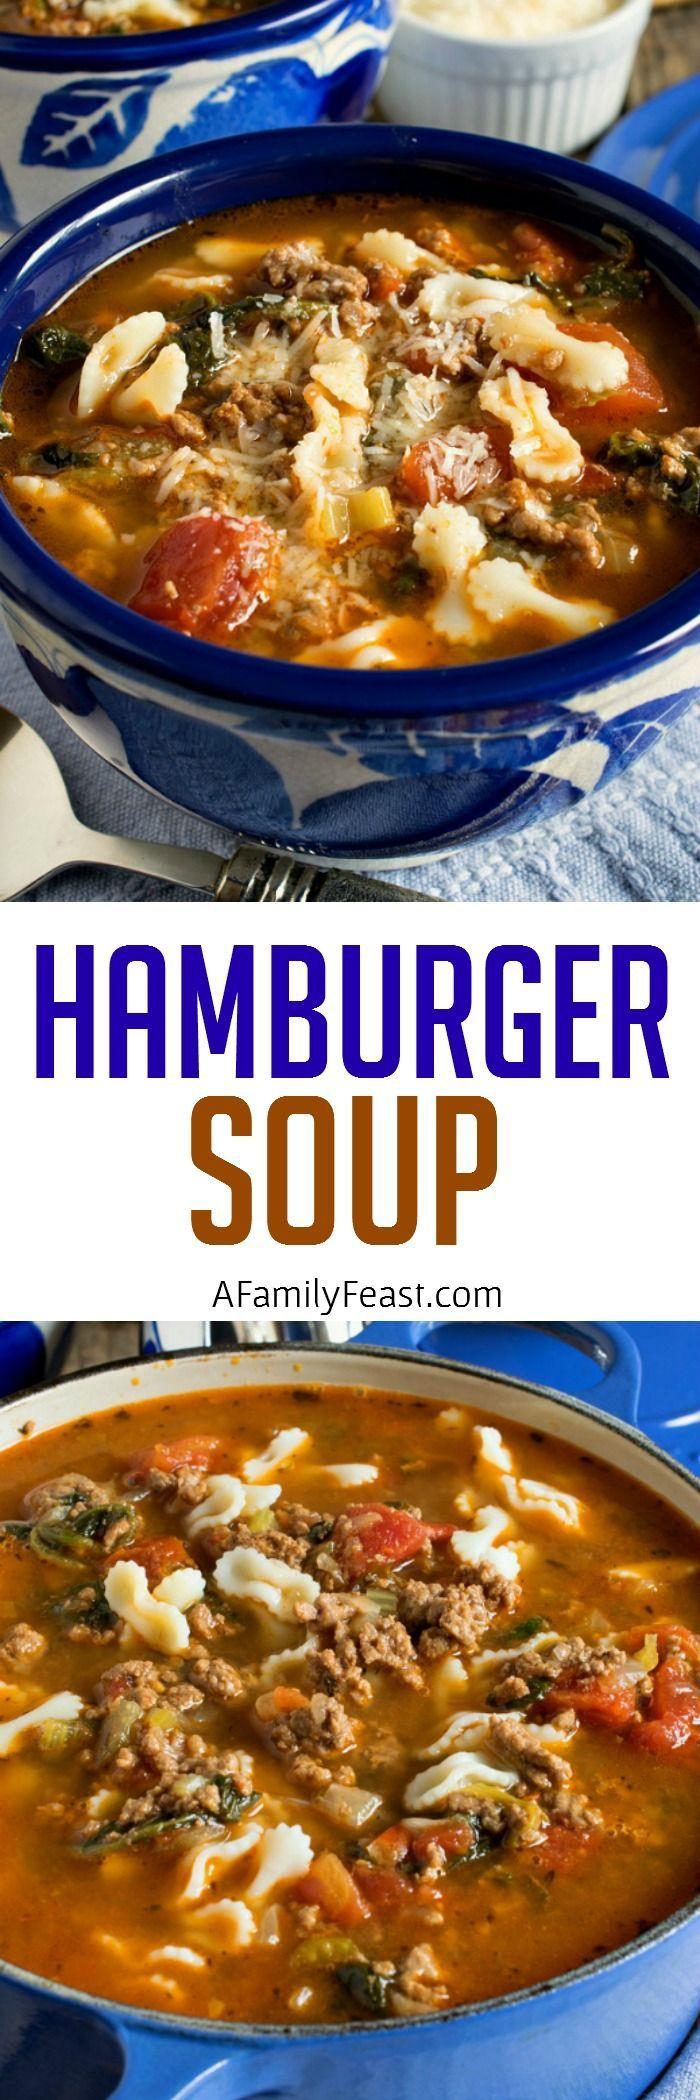 Hamburger Soup - A Family Feast